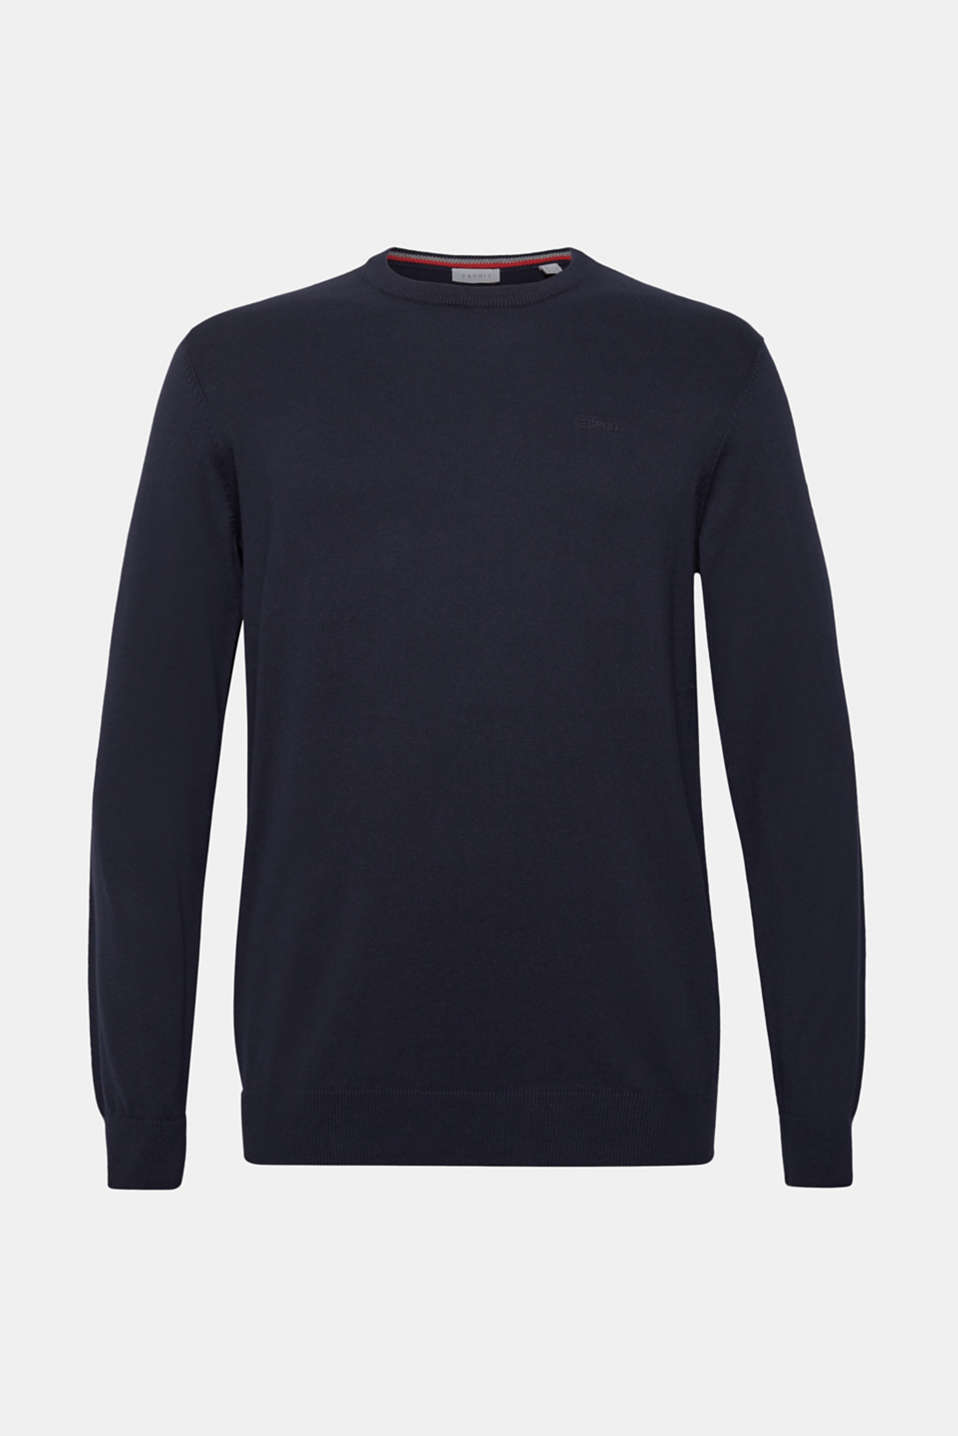 Jumper with a round neckline, 100% cotton, NAVY, detail image number 6